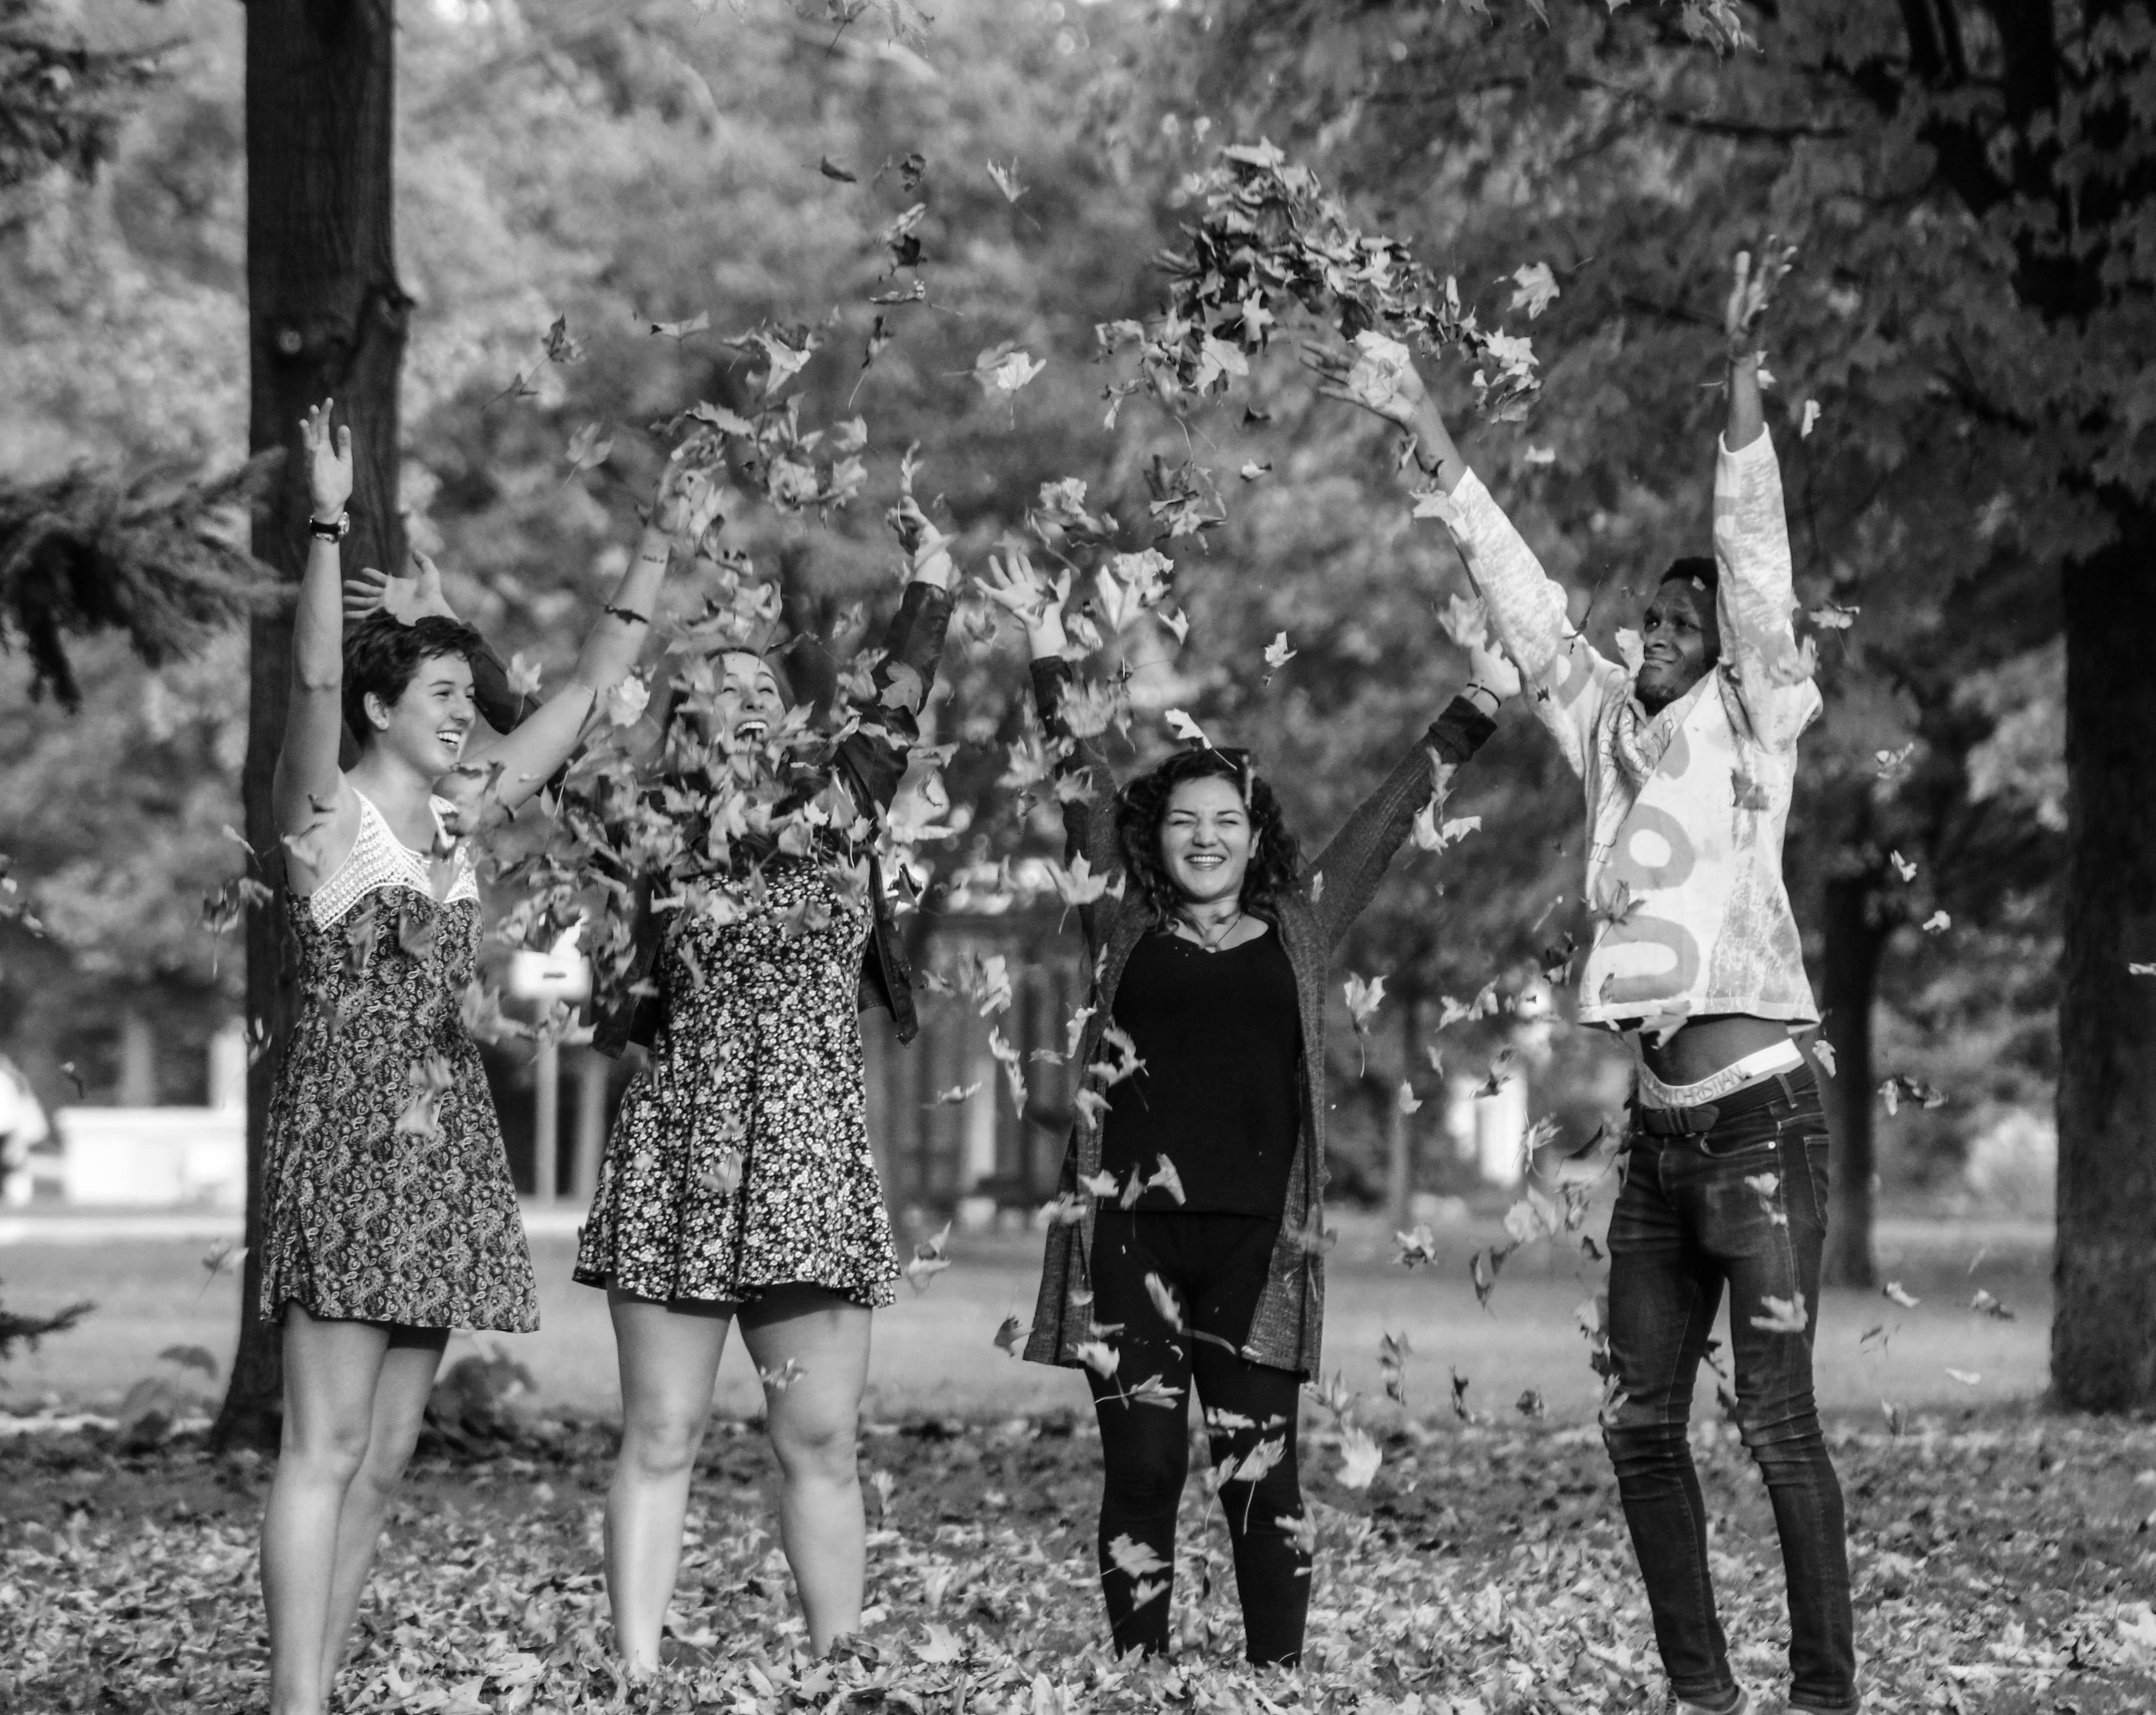 Juniors Delaney Olsen, Madeleine Moran, Sally Alvarado and Jamil Fuller relish the autumn weather during Fall Festival. Photo by Allegra Taylor